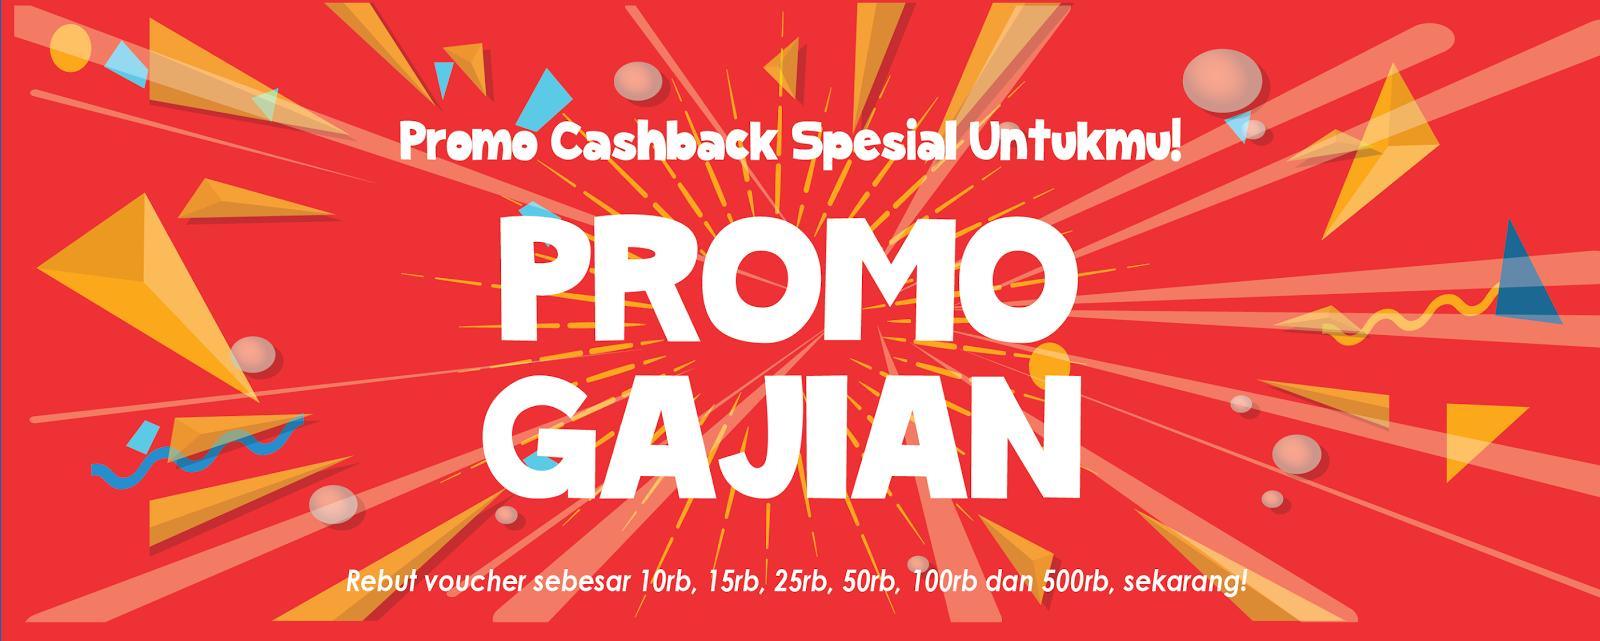 Yuk Berburu Cashback S D 500 Ribu Di Promo Gajian Vipdiskon